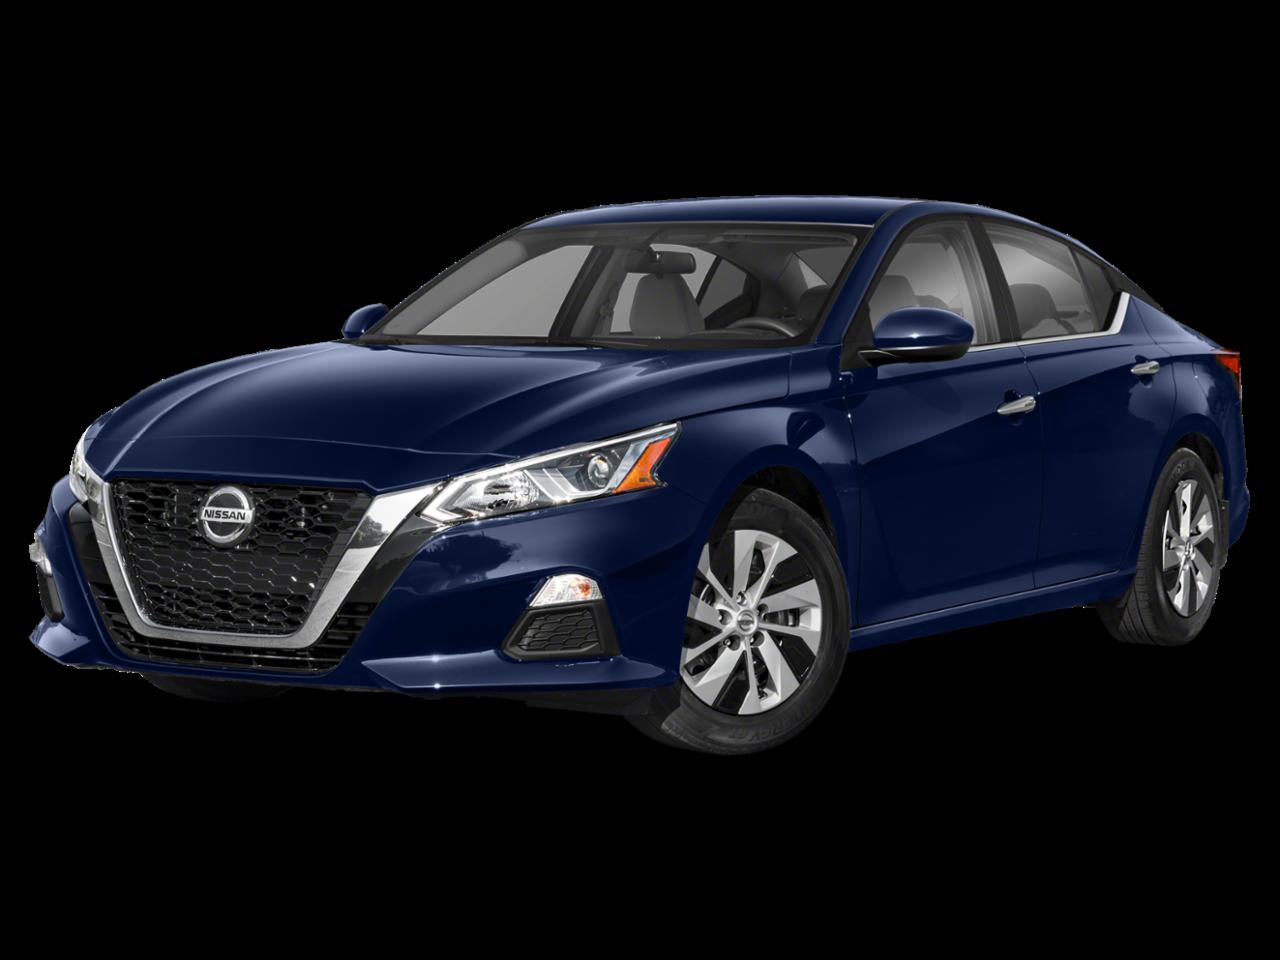 Nissan 2019 Altima 2.5 S